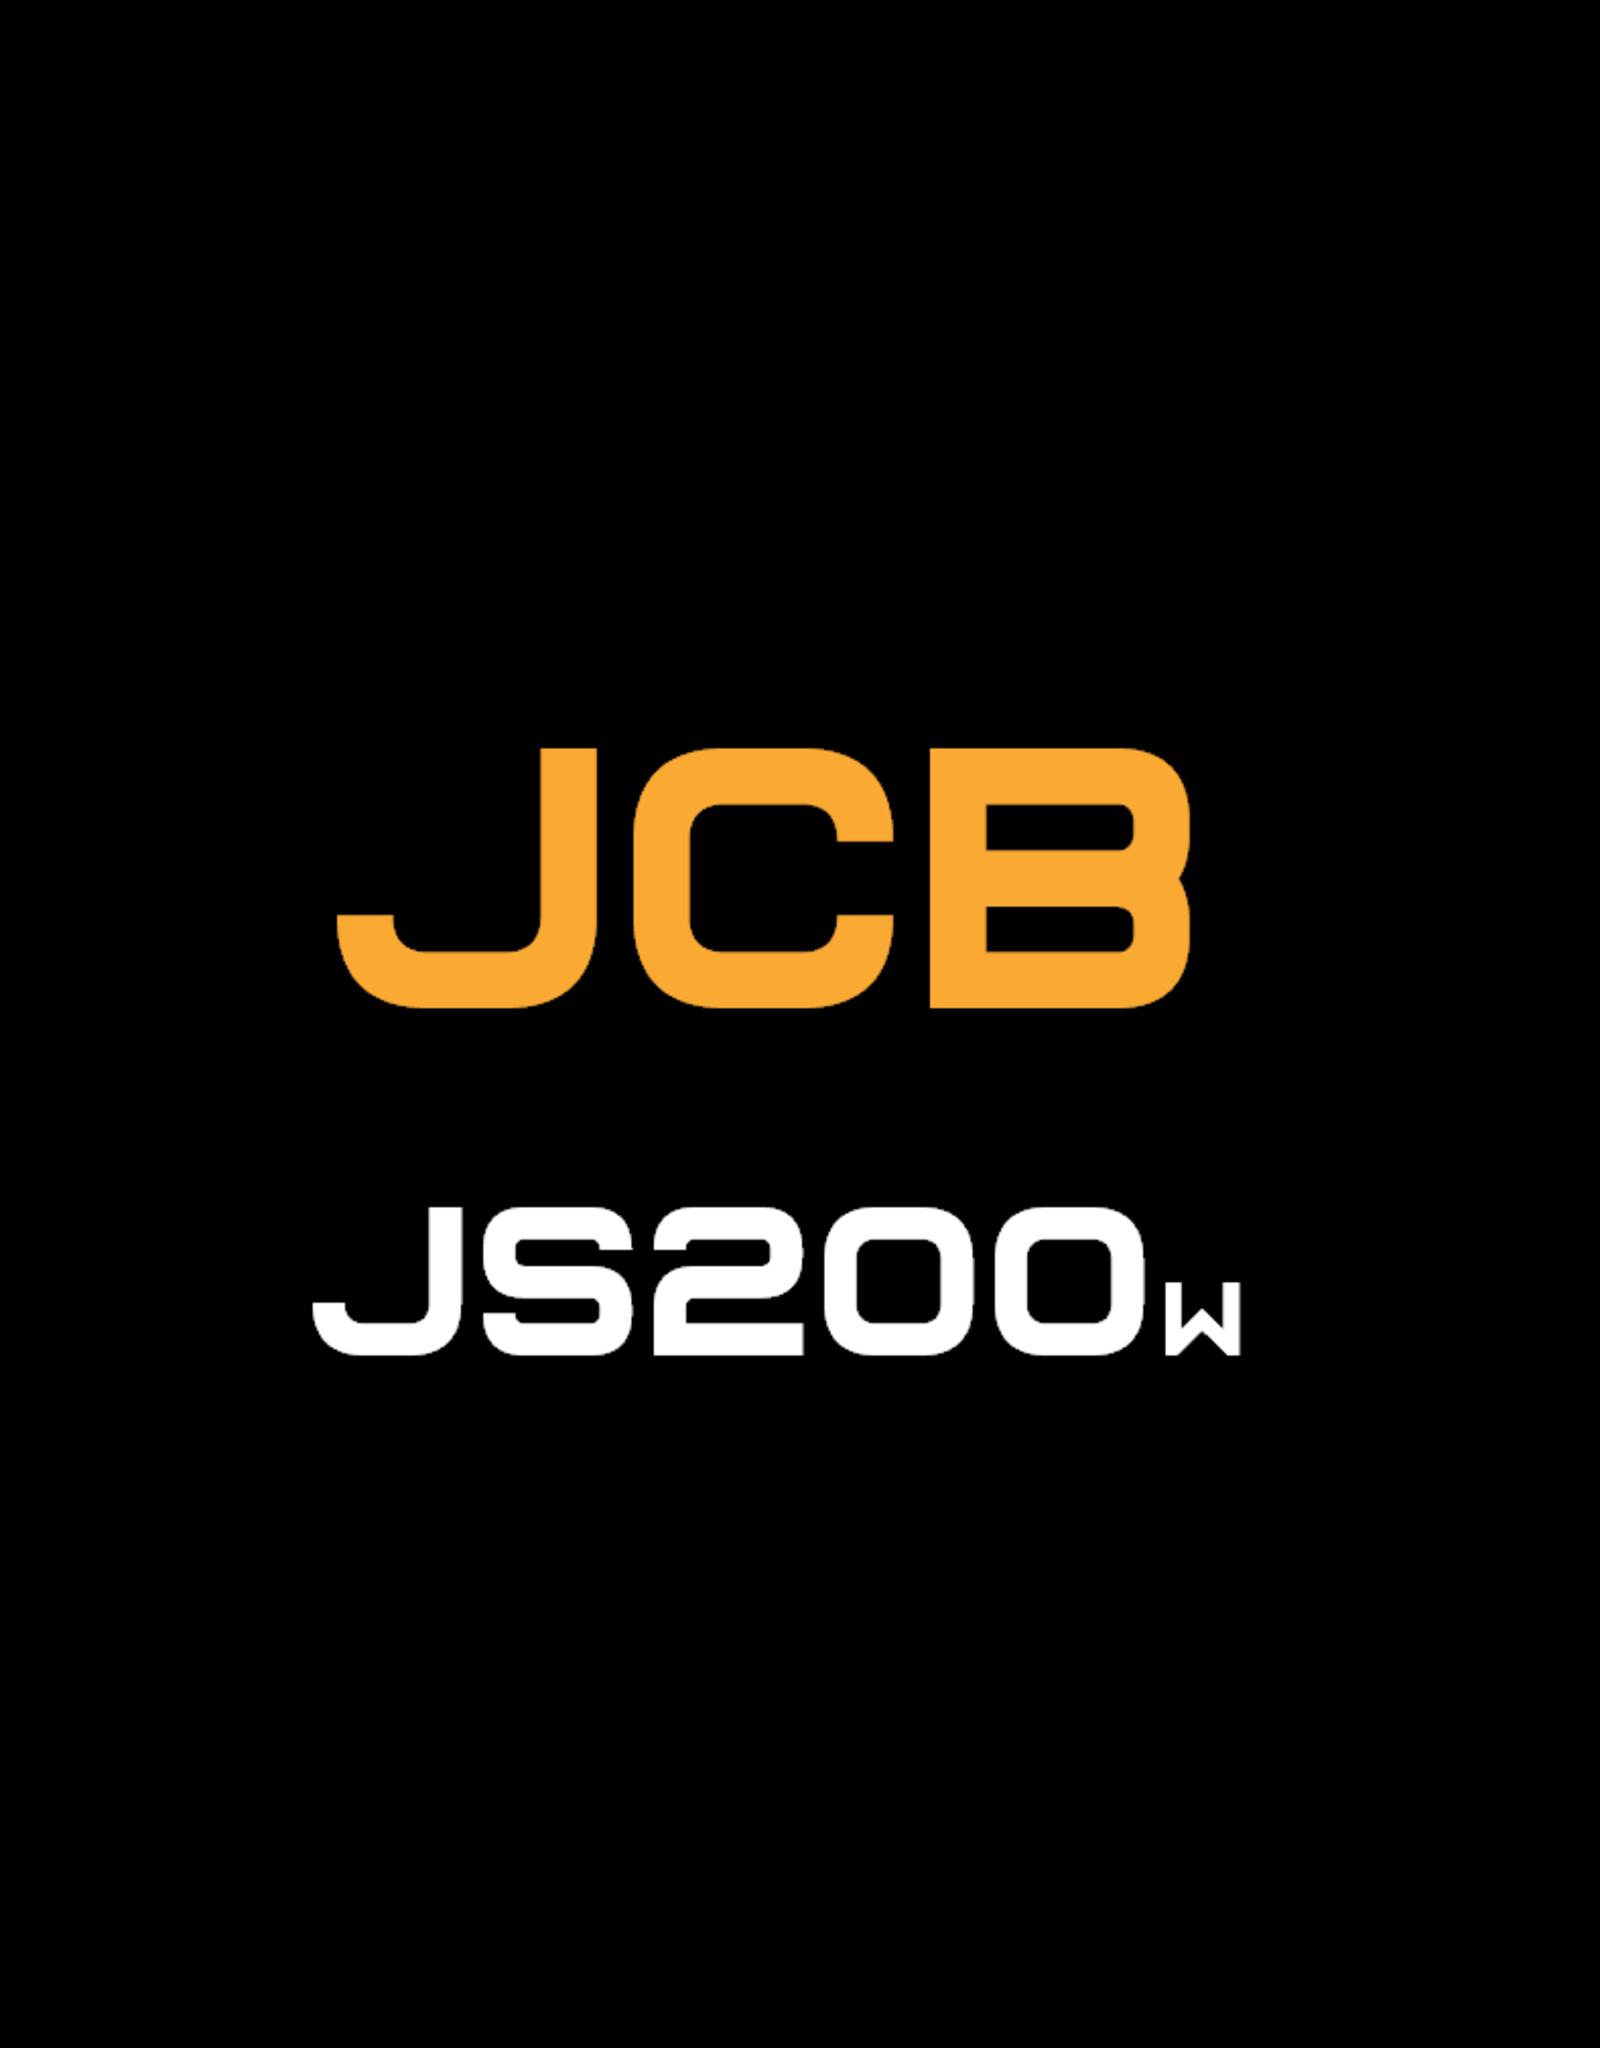 Echle Hartstahl GmbH FOPS pour JCB JS200W